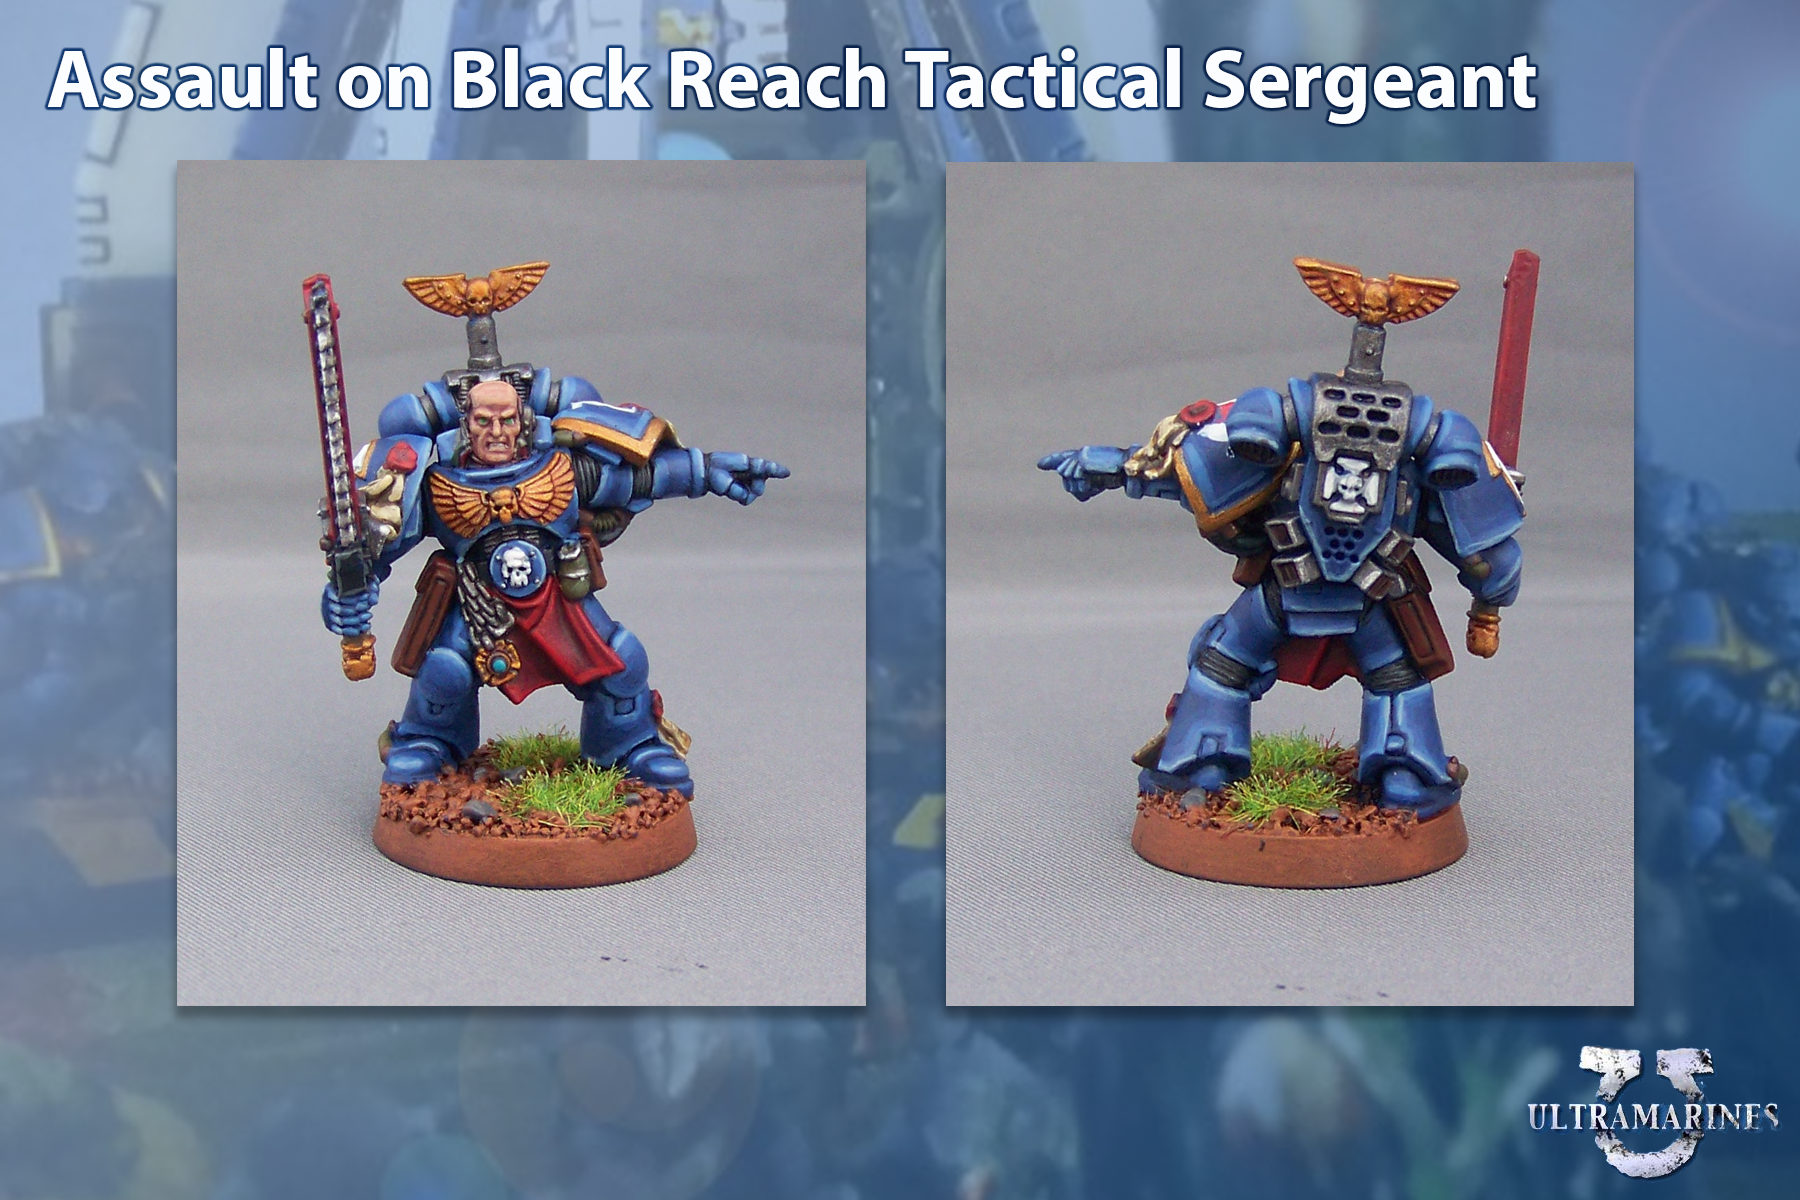 Assault On Black Reach, Sergeant, Space Marines, Tactical Squad, Ultramarines, Warhammer 40,000